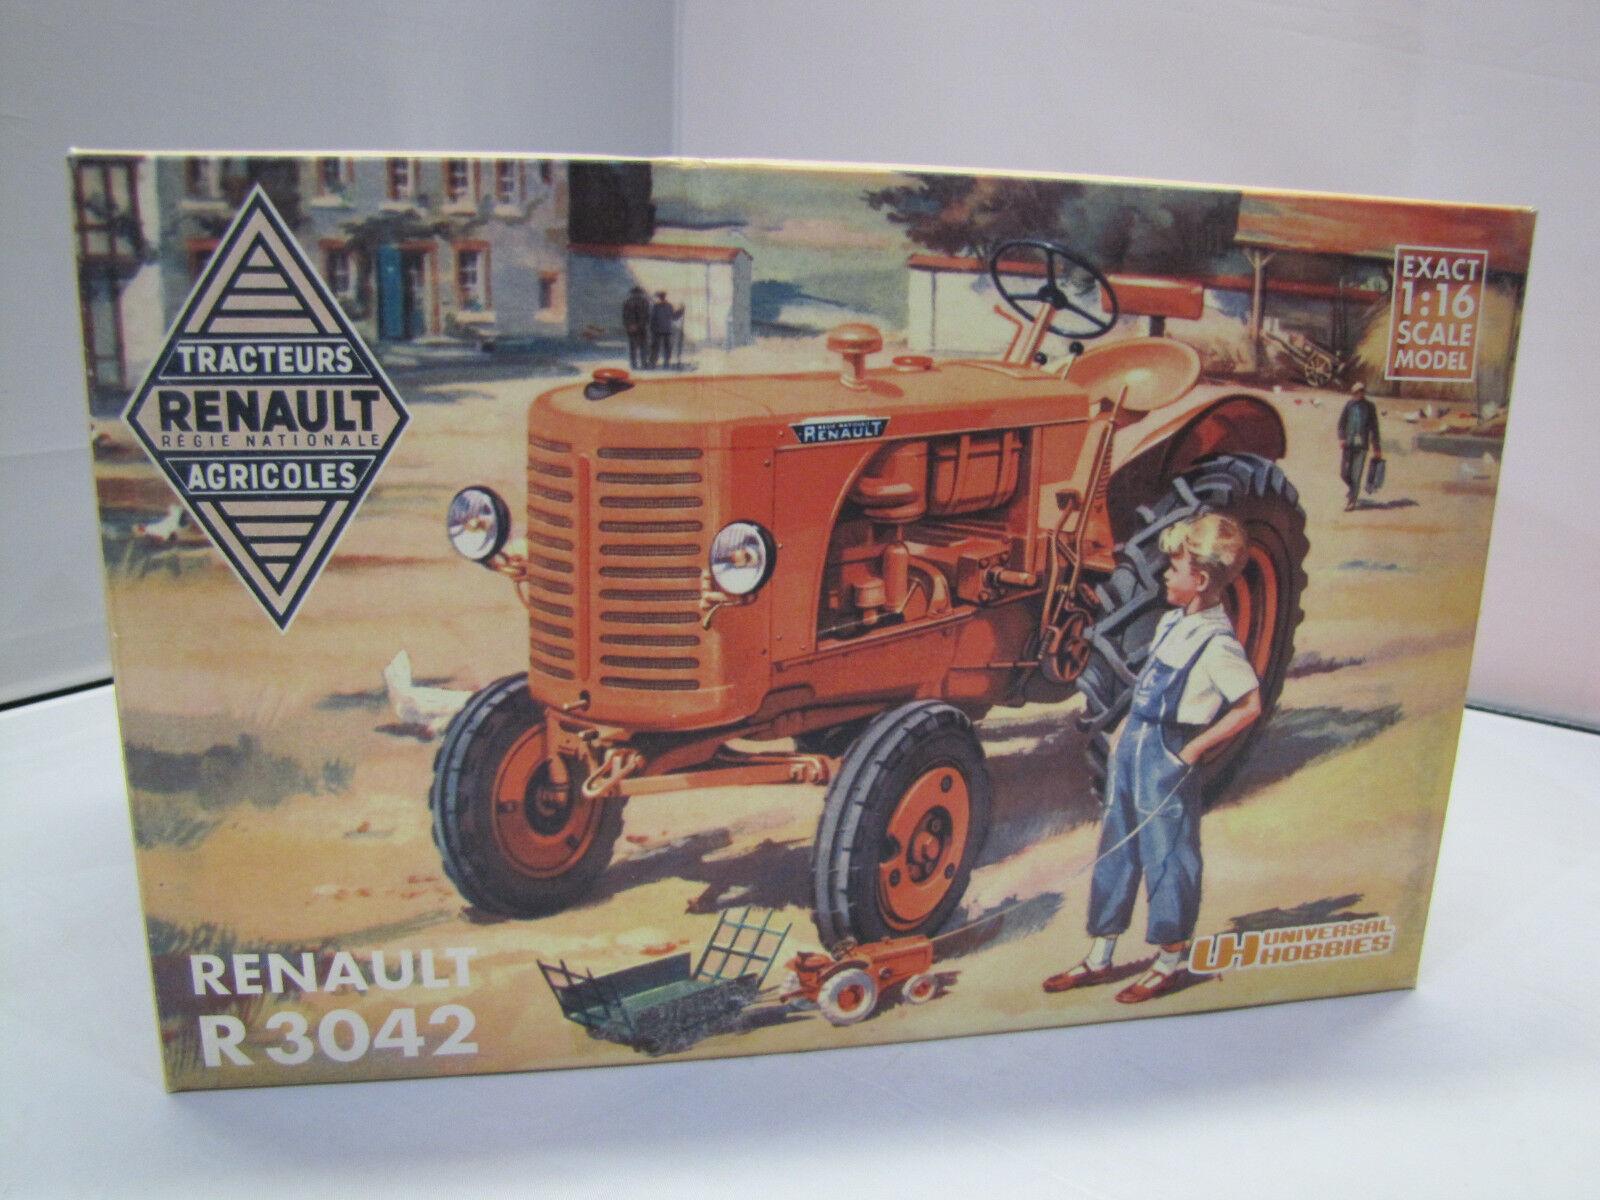 Uh2227 UH Universal Hobbies Renault R 3042 - 1950 - 1 16